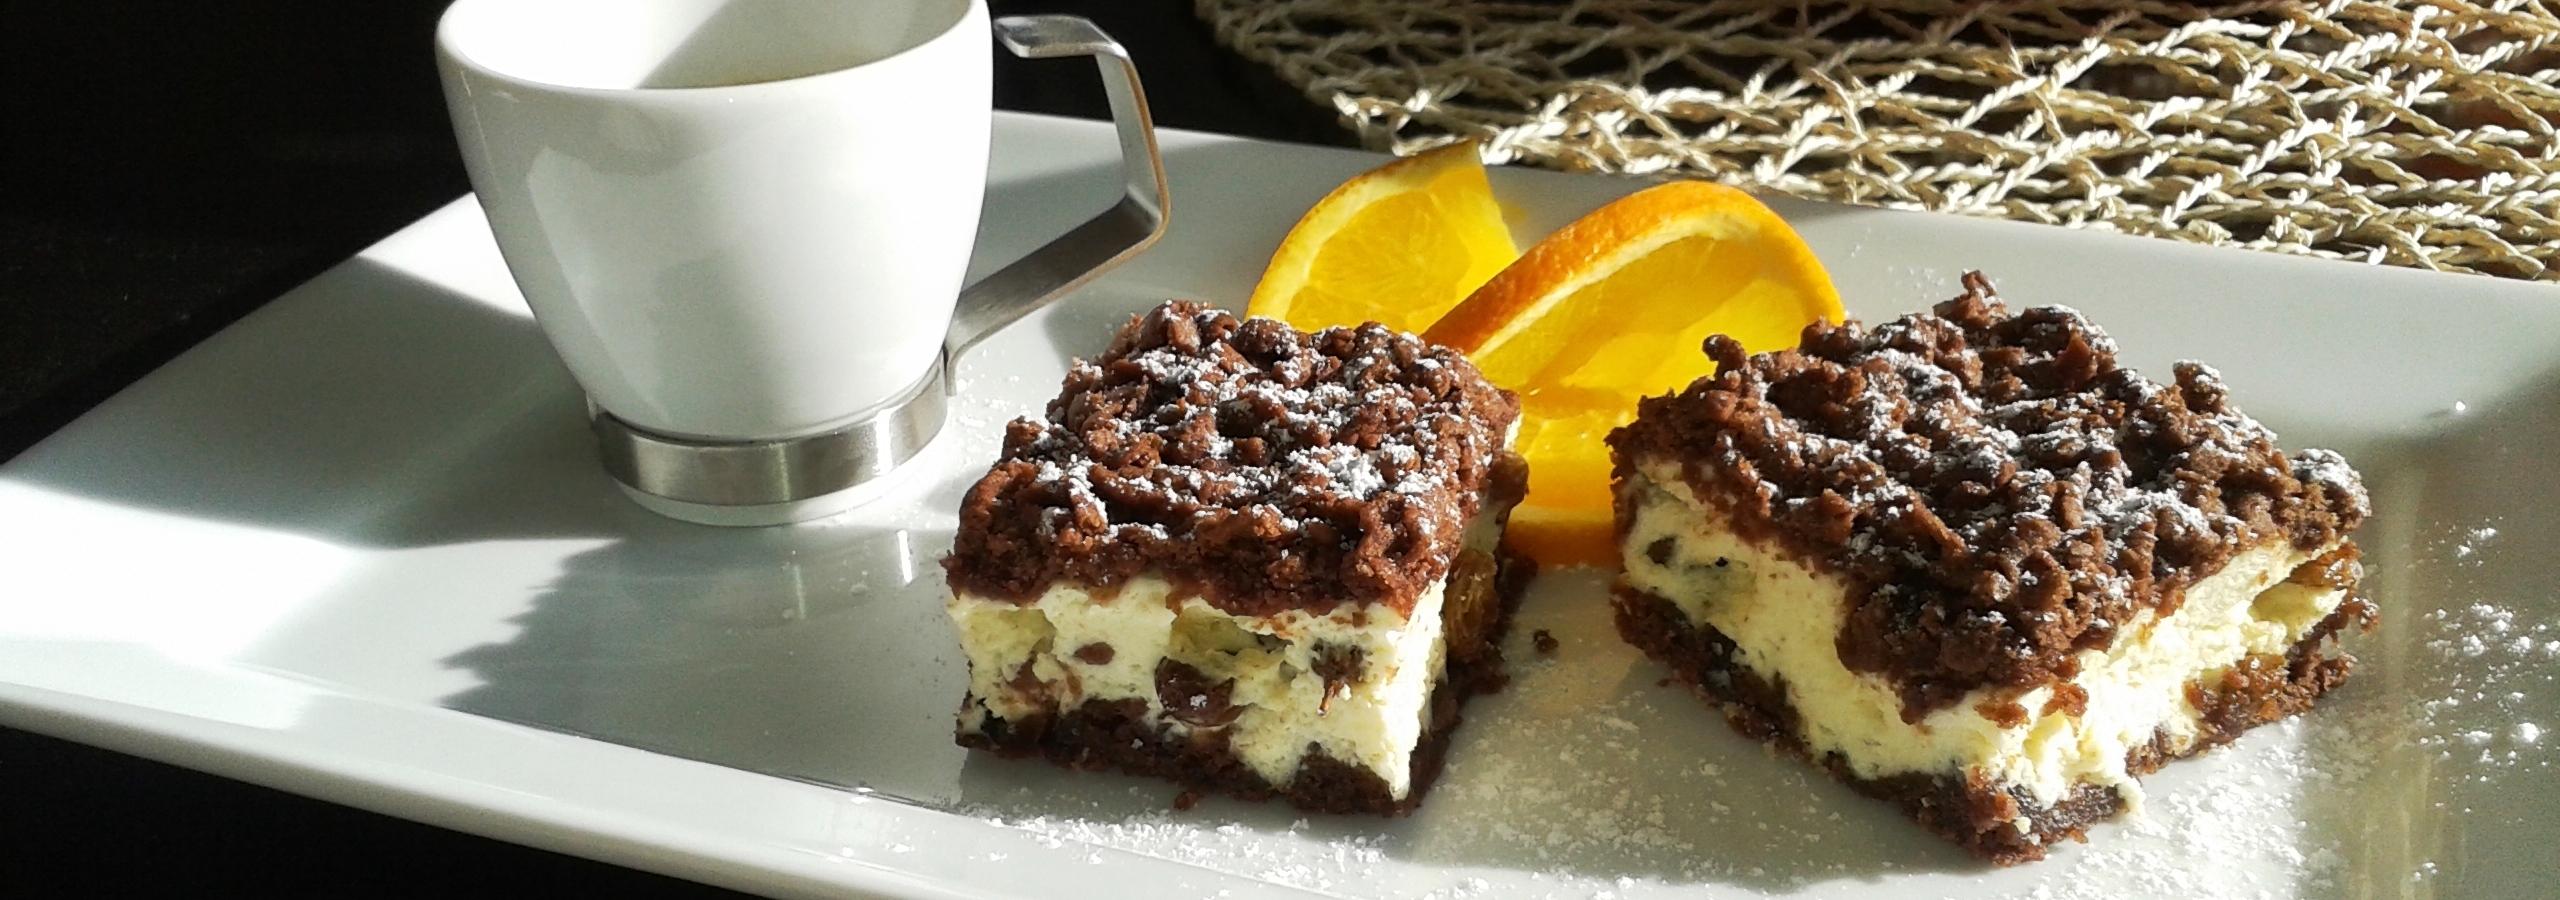 Ríbezľový koláč s tvarohom